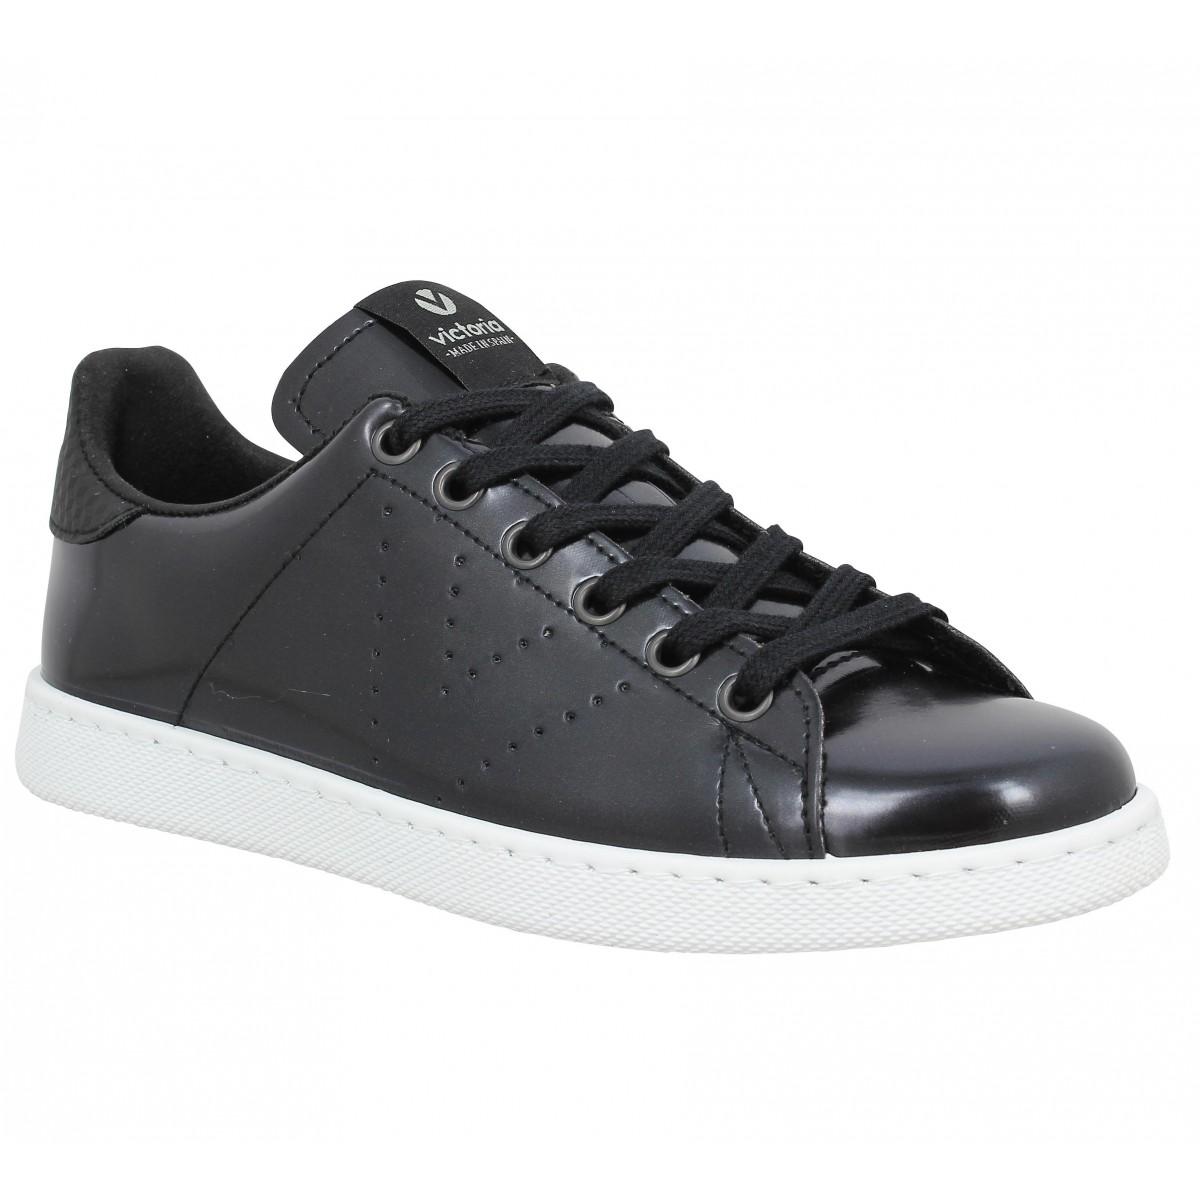 new products eeb08 99acd Un rétro pour le chaussures victoria Rose - eveil-musical-larochelle.fr